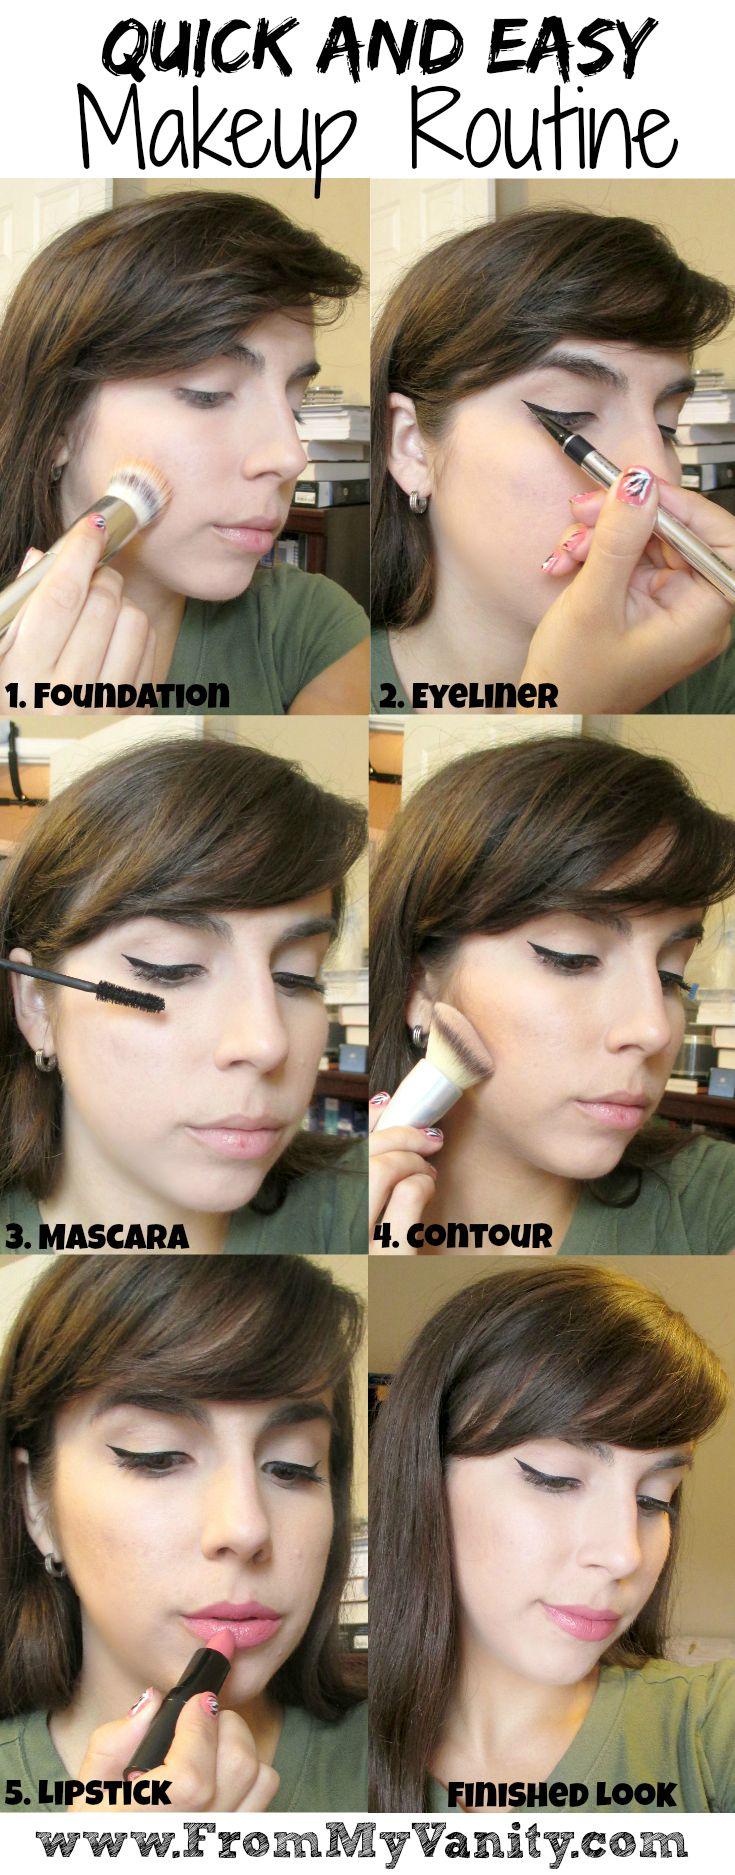 morning-sickness-product-makeup-routine-pin